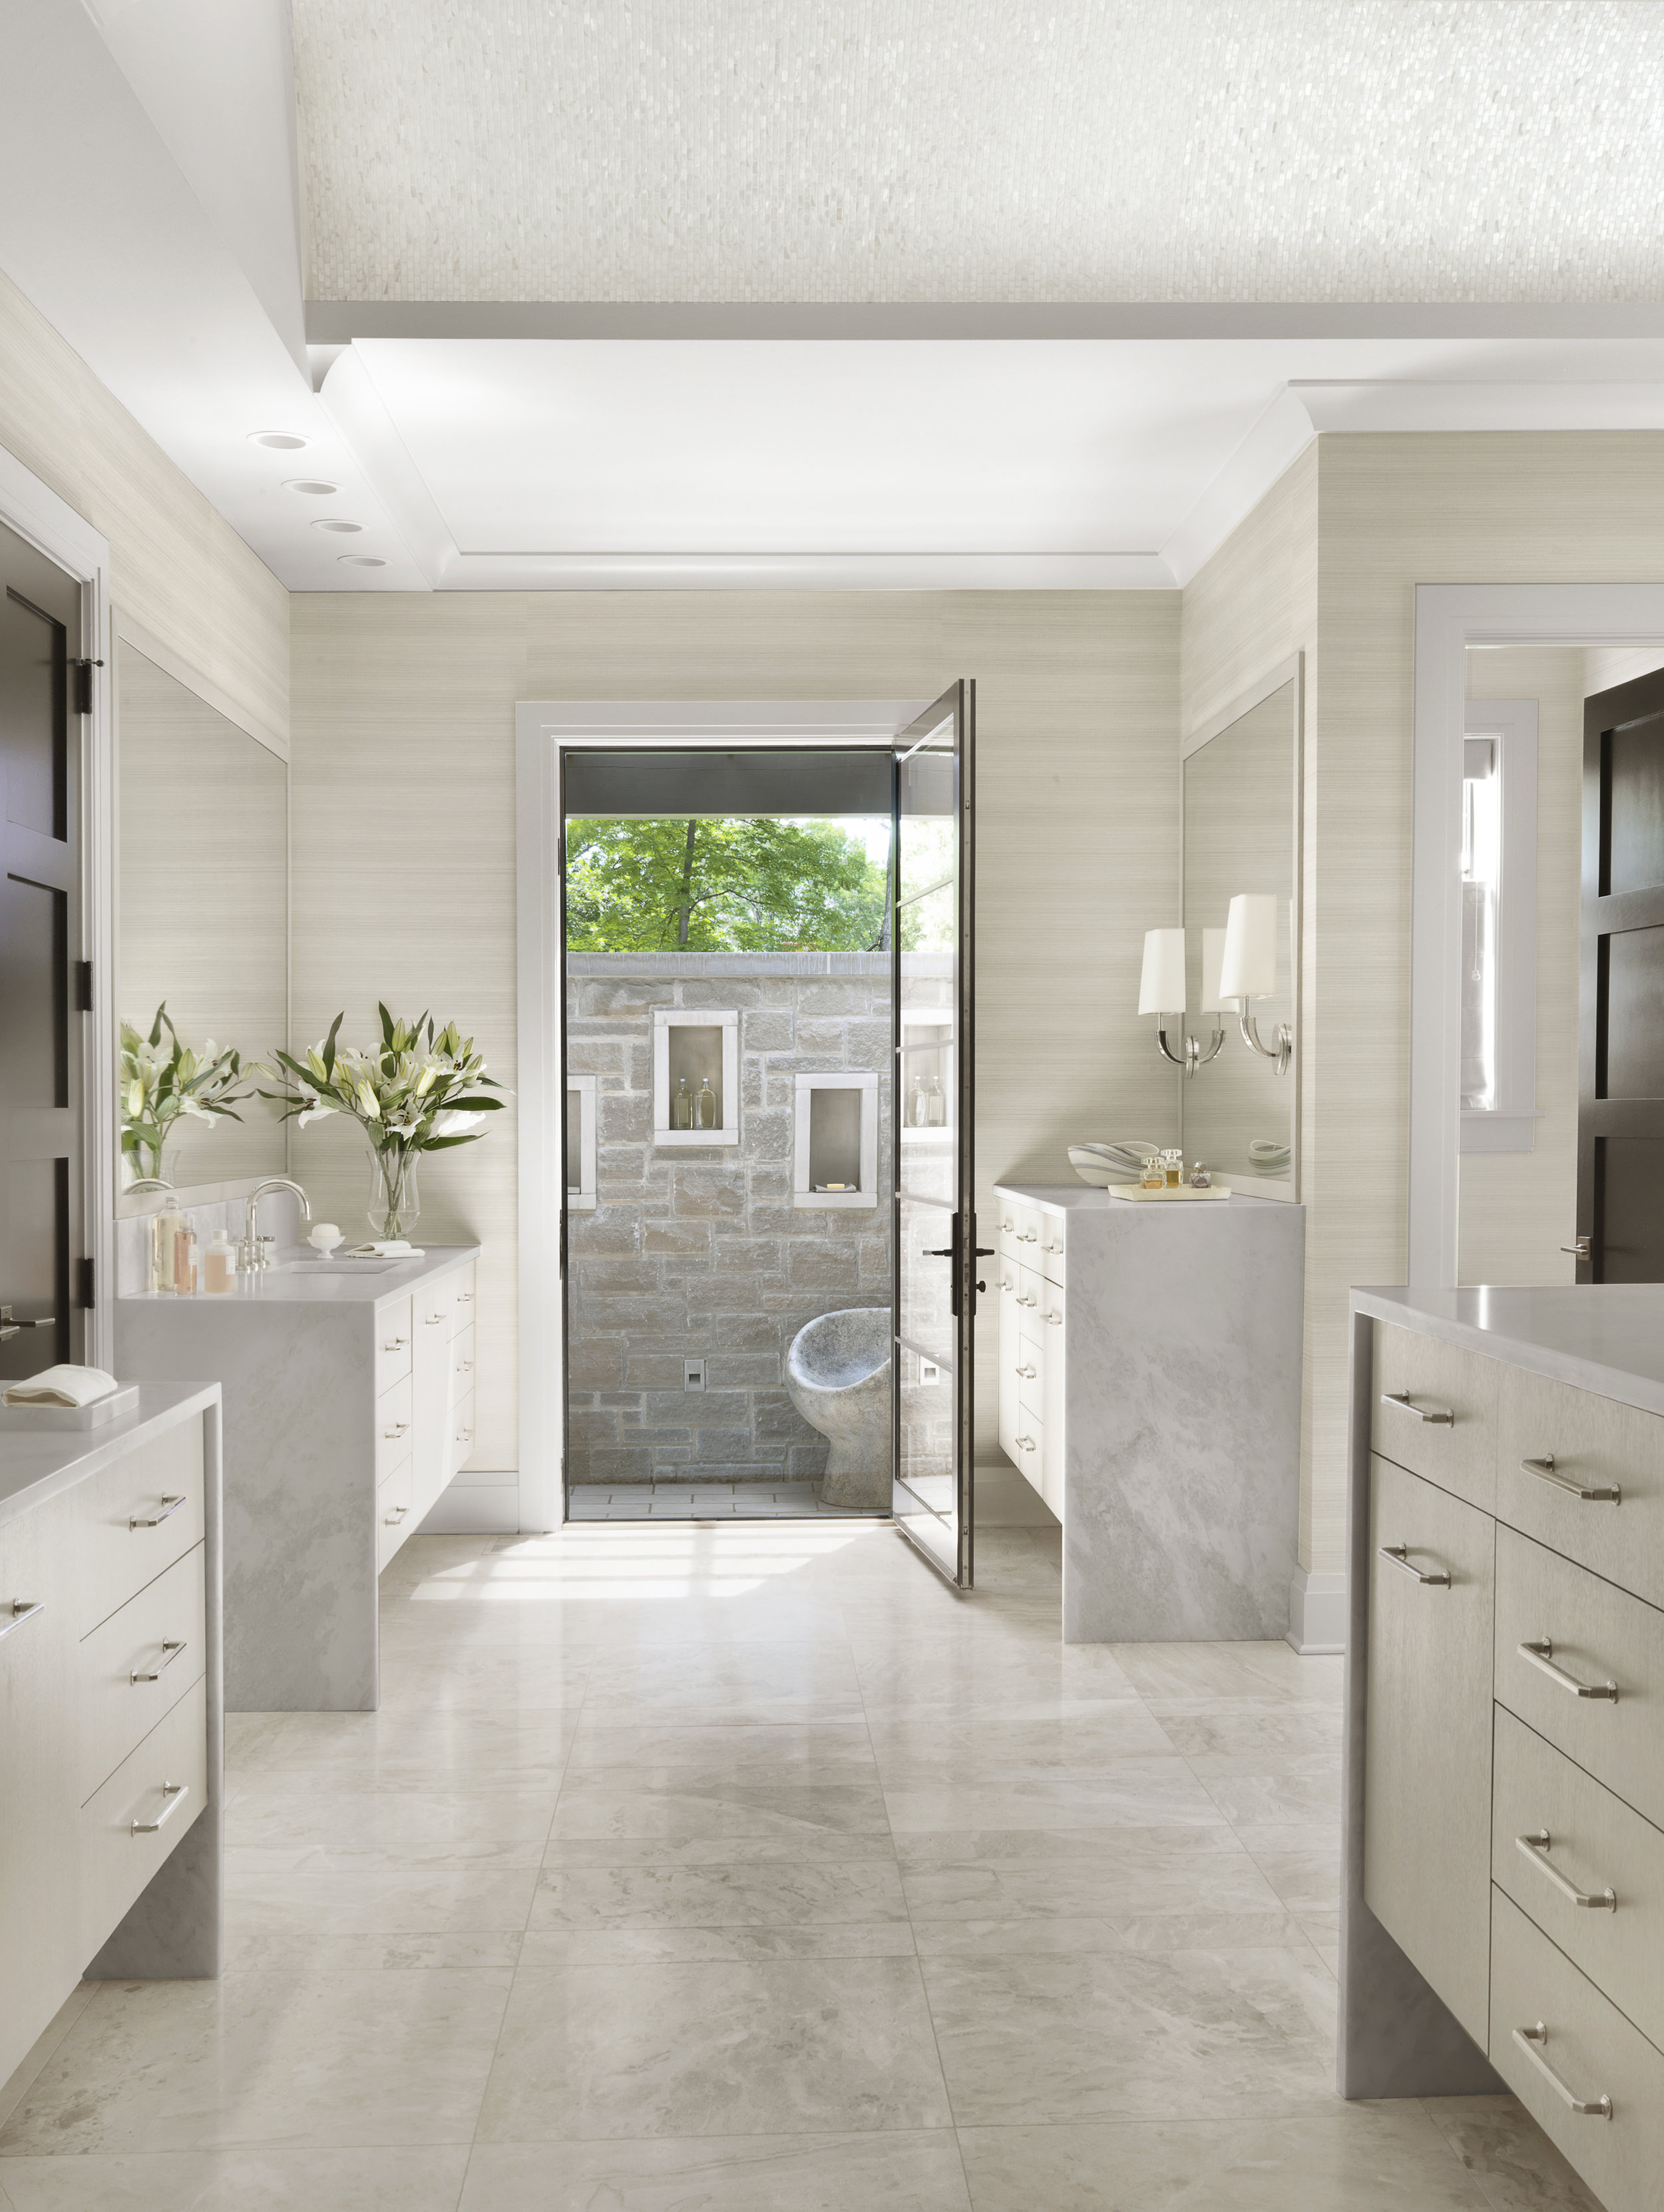 Bathroom with OutdoorShower.jpg